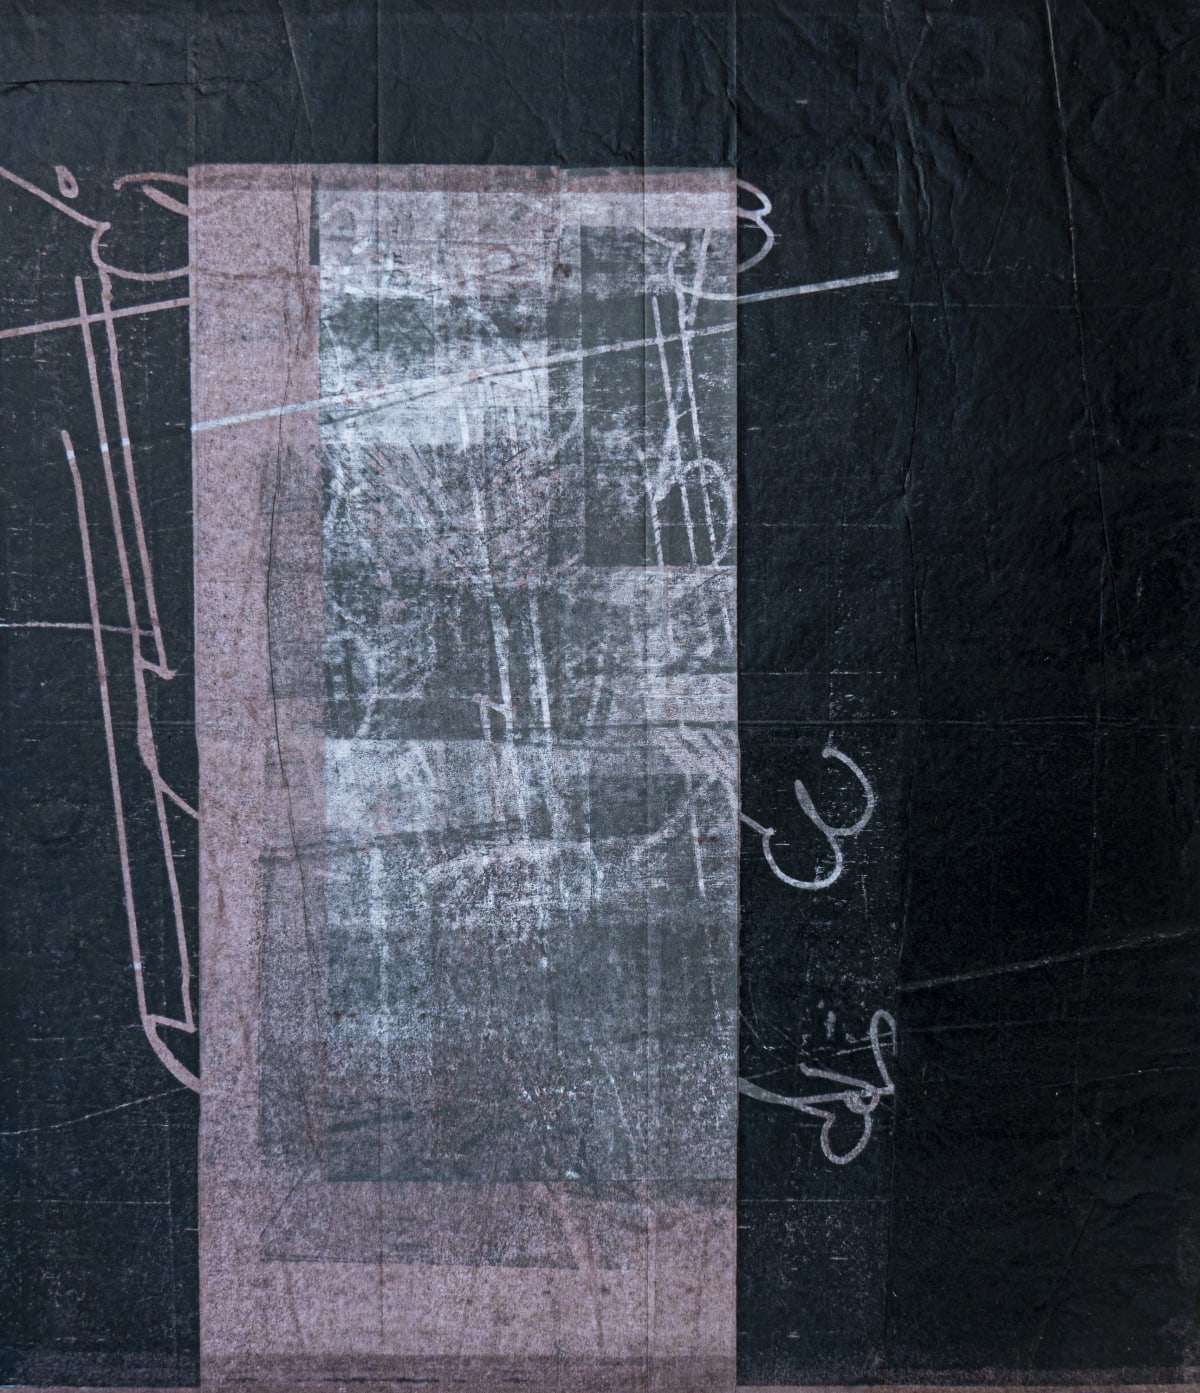 Thomas Gosebruch untitled, 2019 woodcut 57 x 50 cm unique proof